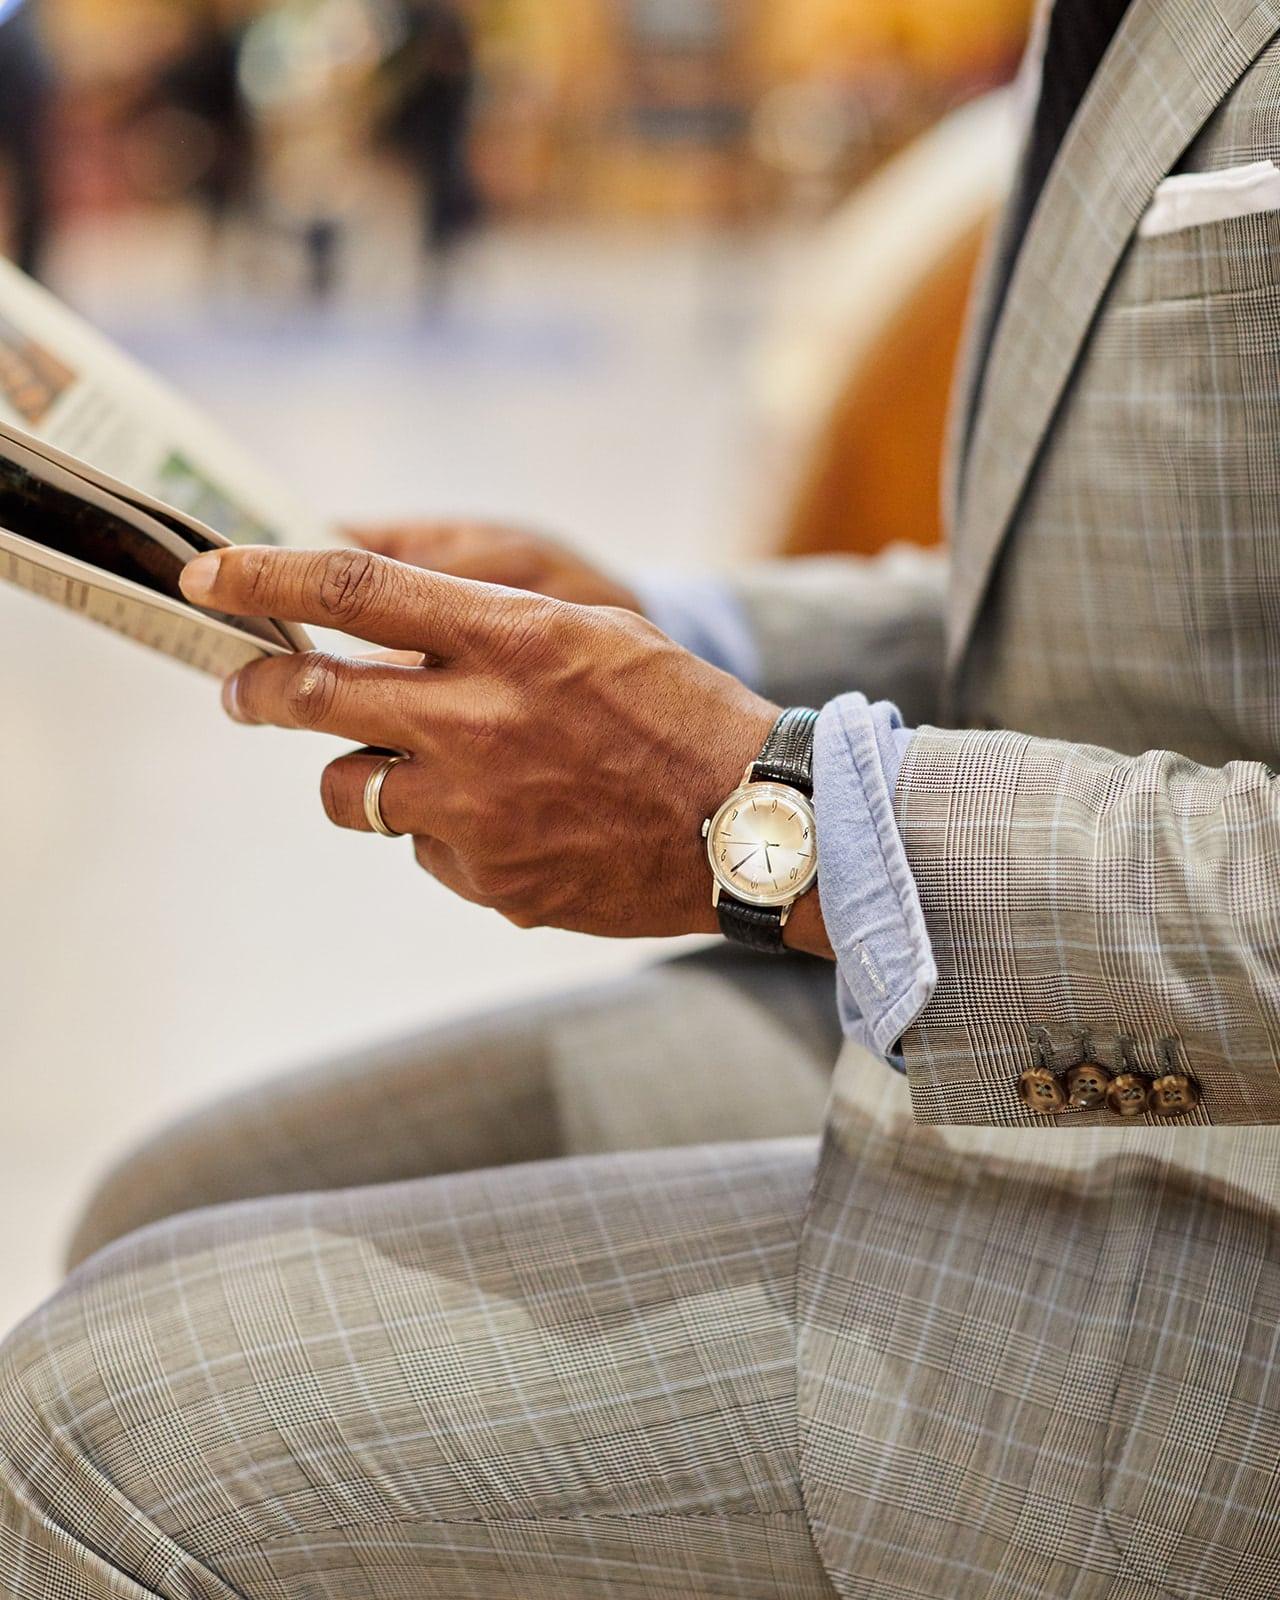 Sabir of Men's Style Pro in Grey ModaMatters x Men's Style Pro suit and Allen Edmonds Black Monstrap Shoes Classic American Workwear